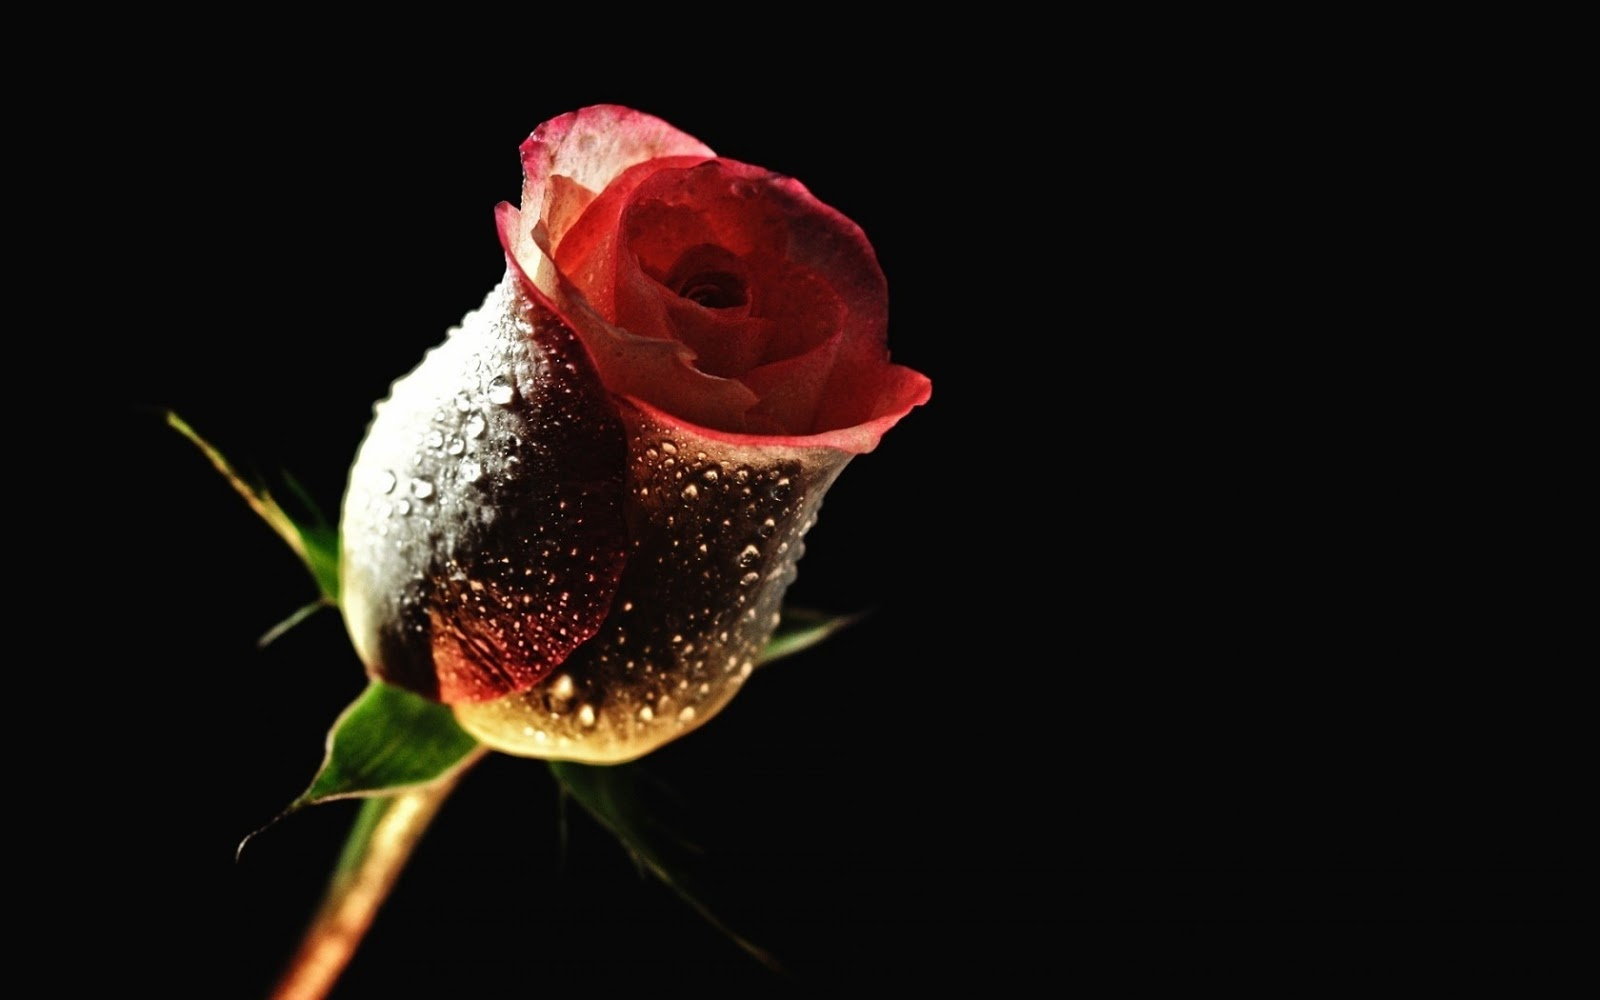 Black Red Rose HD Image wallpaper